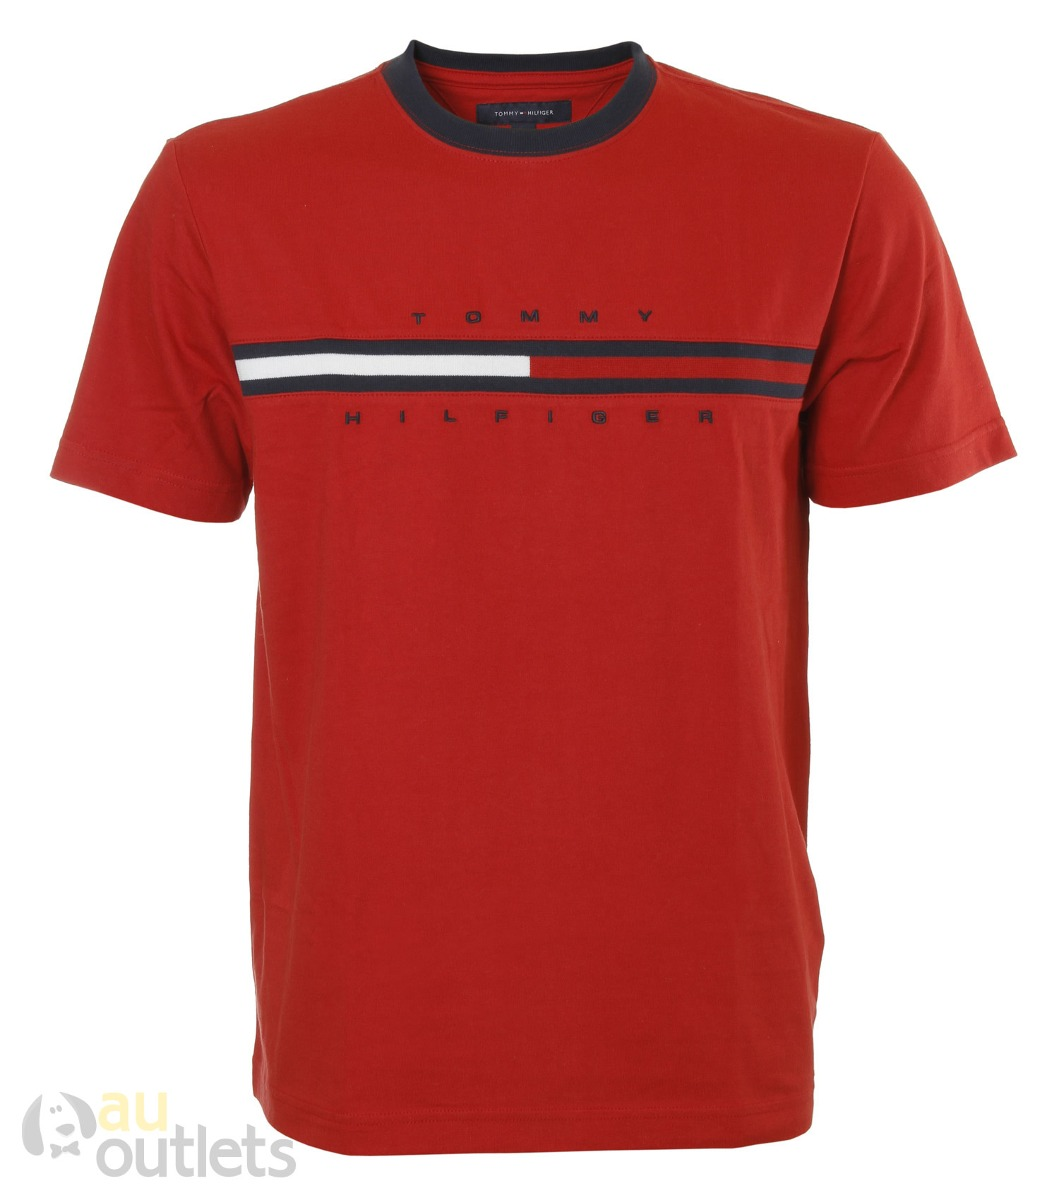 7751488936871 Carregando zoom... camiseta masculina tommy hilfiger monet